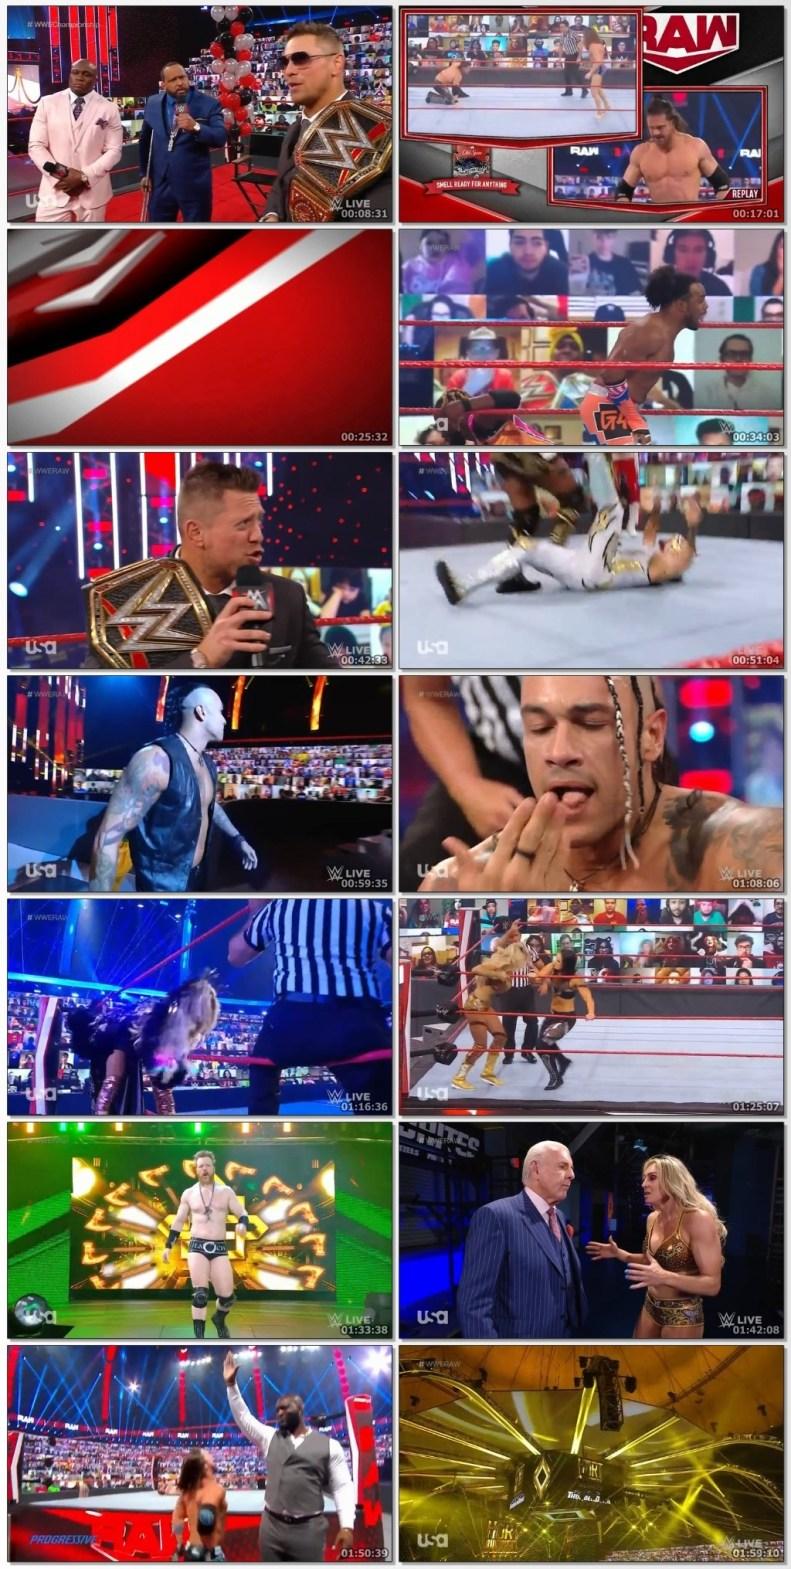 WWE-Monday-Night-Raw-22-February-2021-English-720p-HDTV-1-4-GB-mkv-thumbs